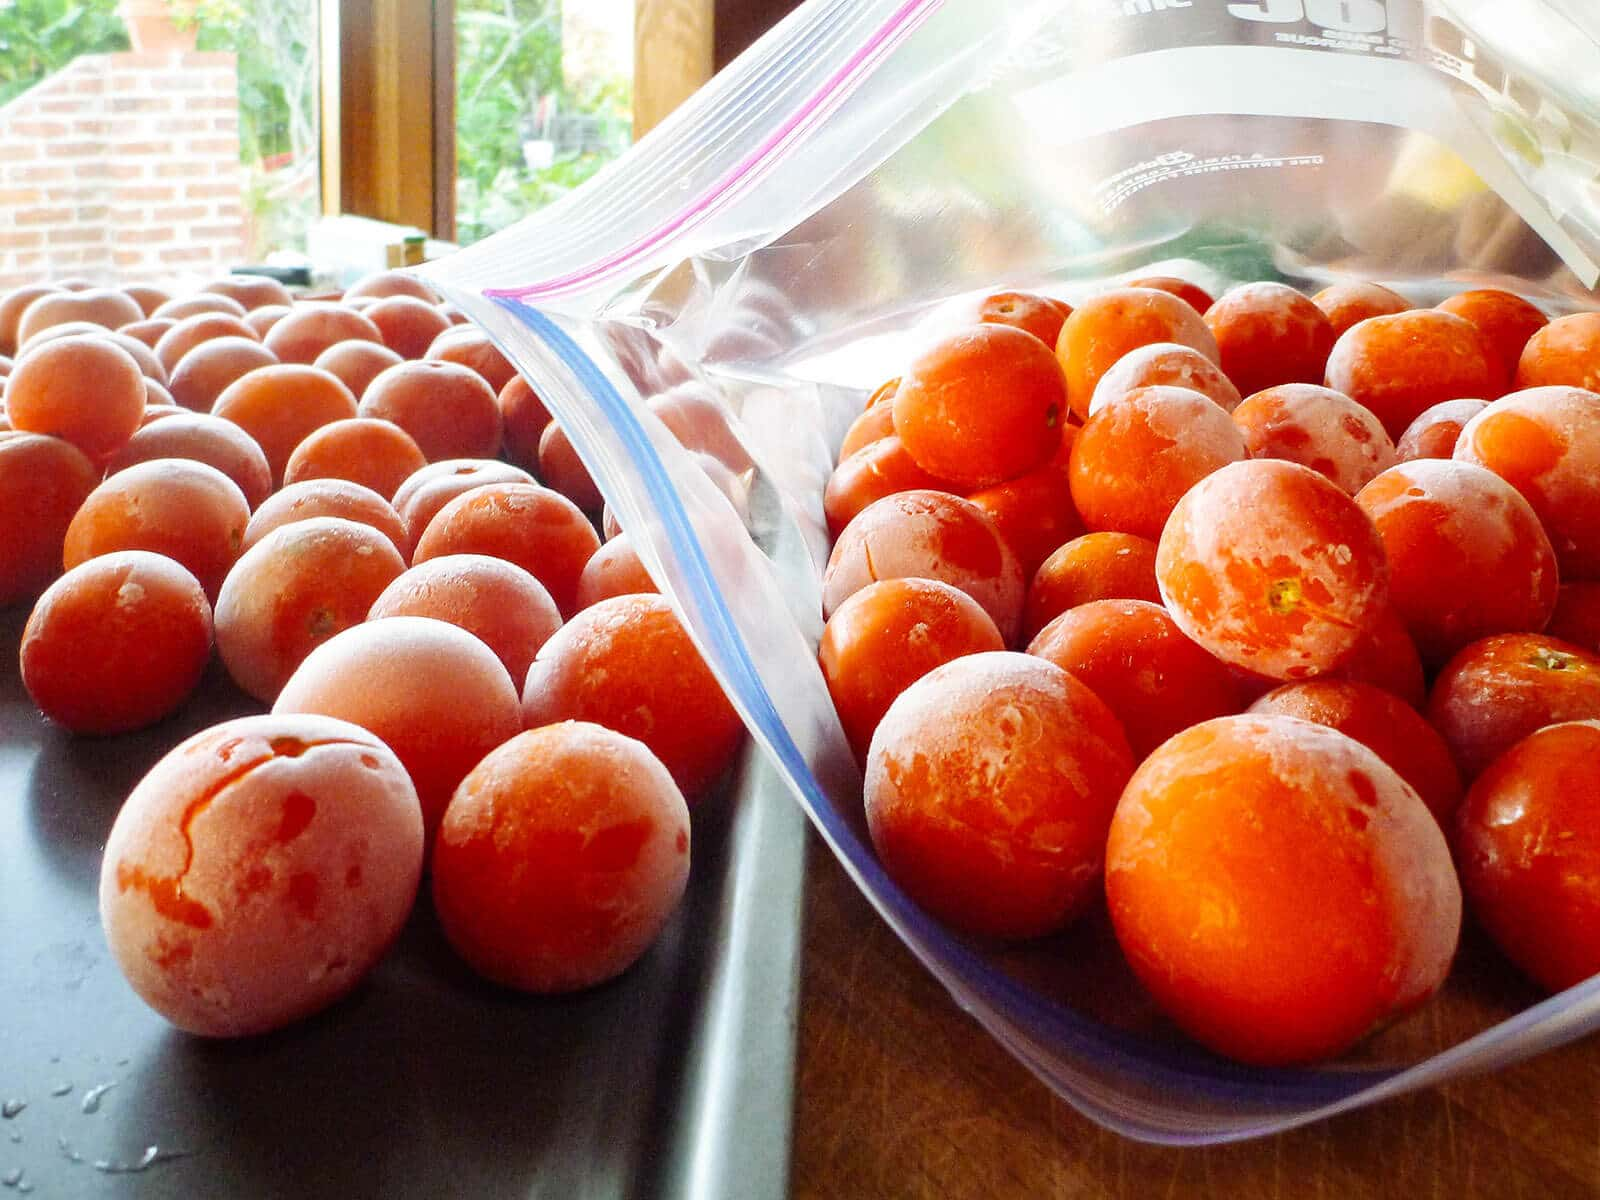 Baking sheet of frozen whole tomatoes next to Ziploc bag of frozen fresh tomatoes